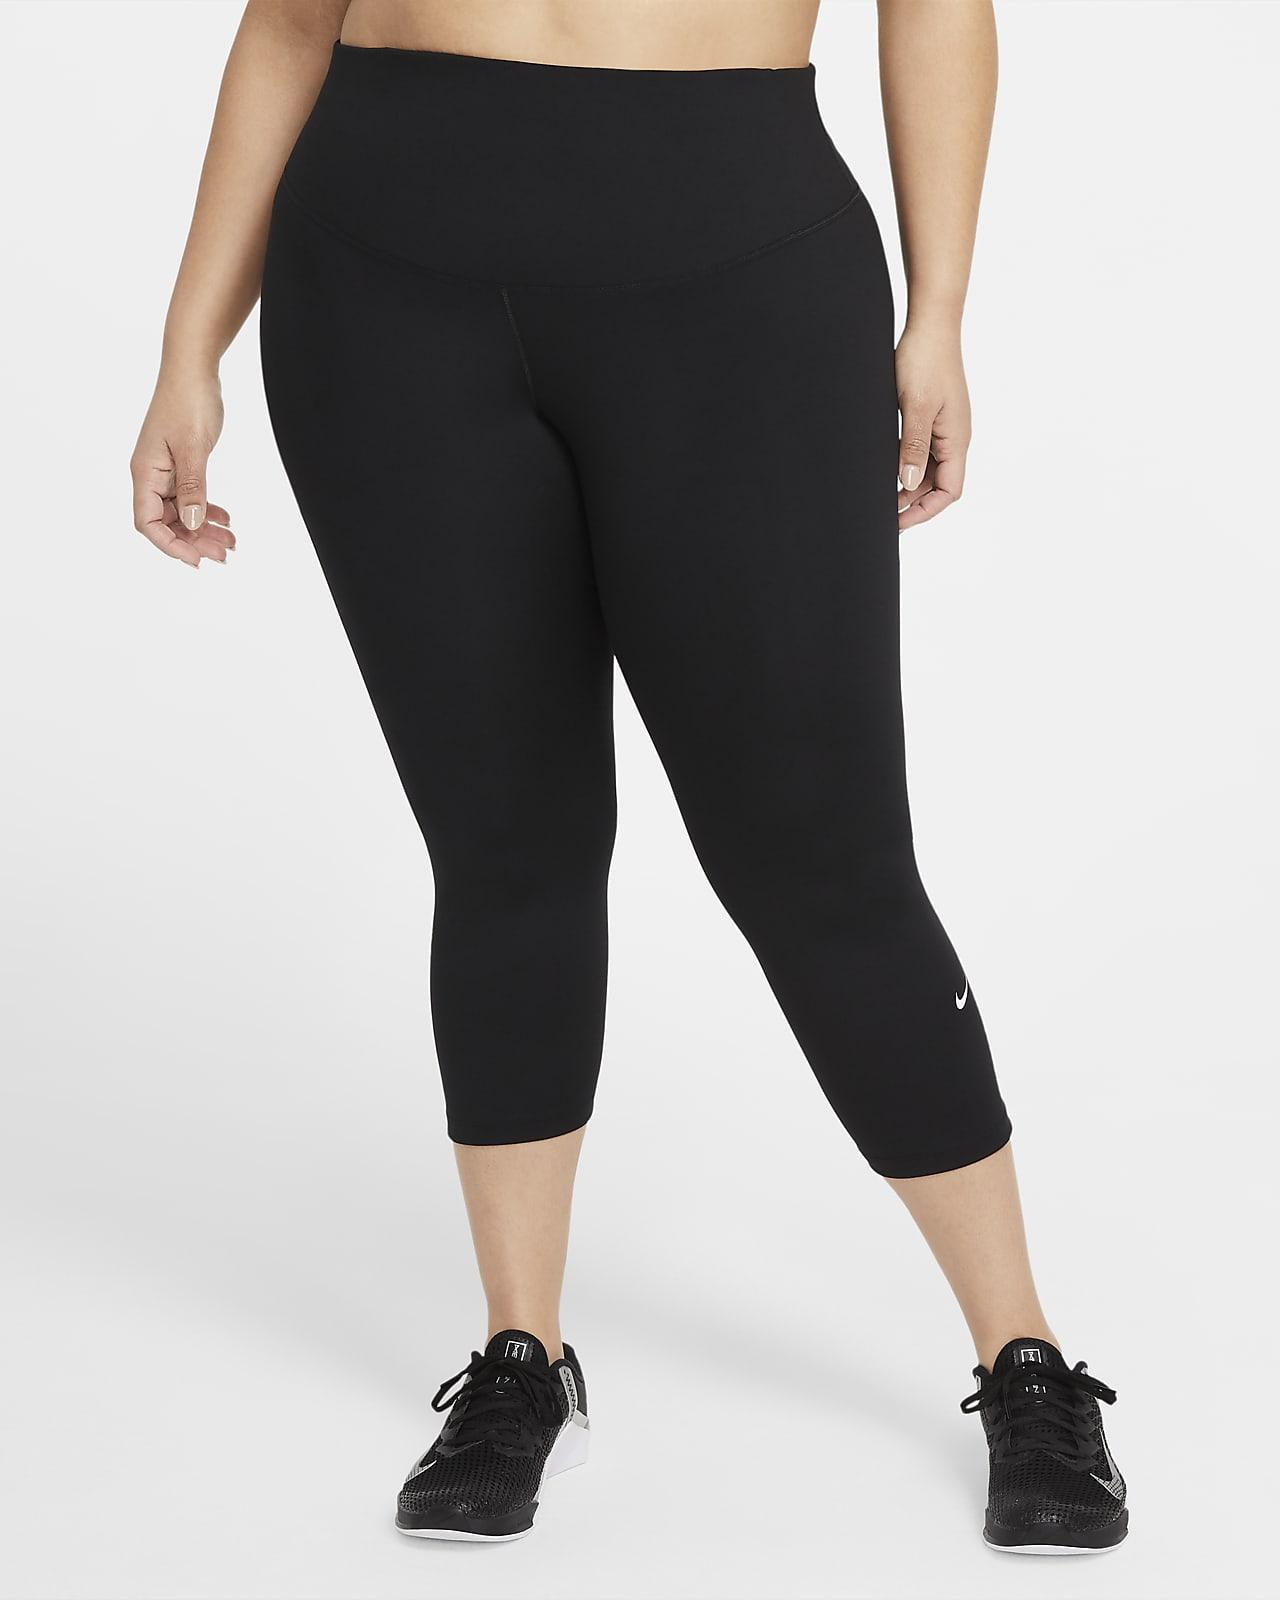 Korte Nike One-leggings med mellemhøj talje til kvinder (plus size)